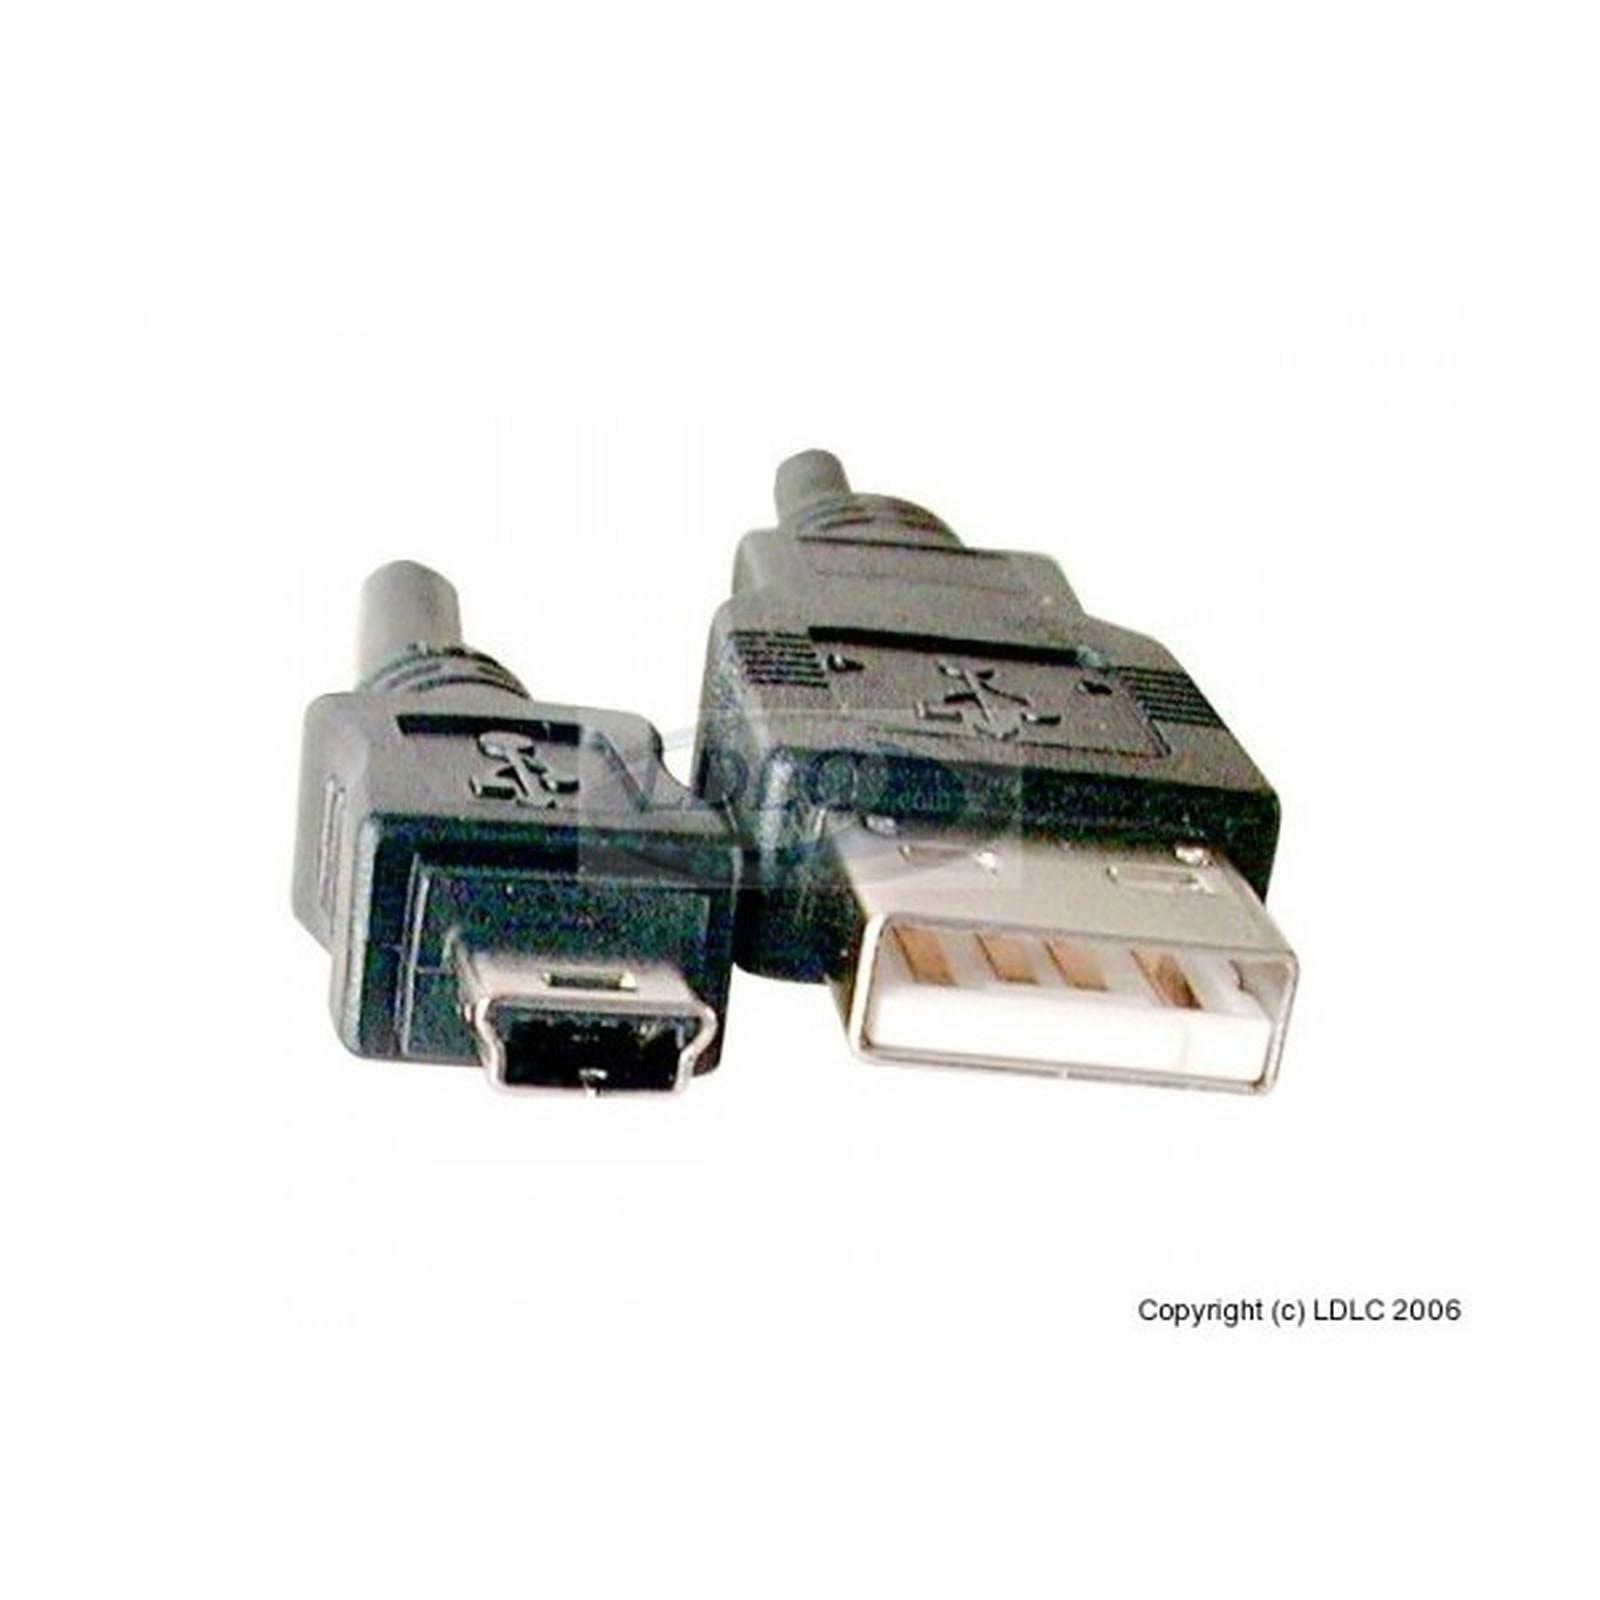 Cable USB 2.0 para periférico mini USB - 3 m